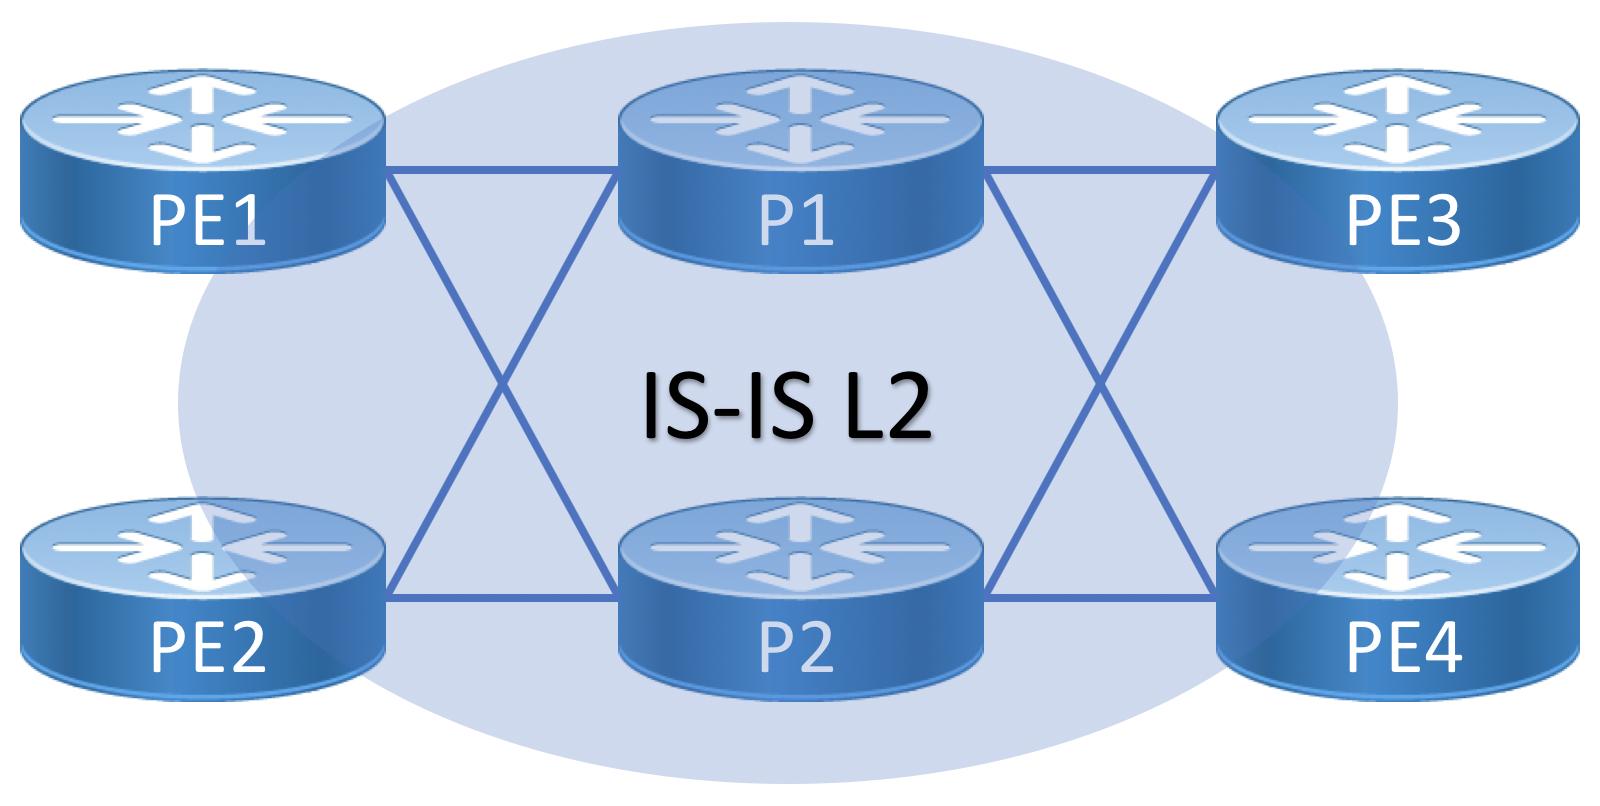 ixp-sr-topology.png